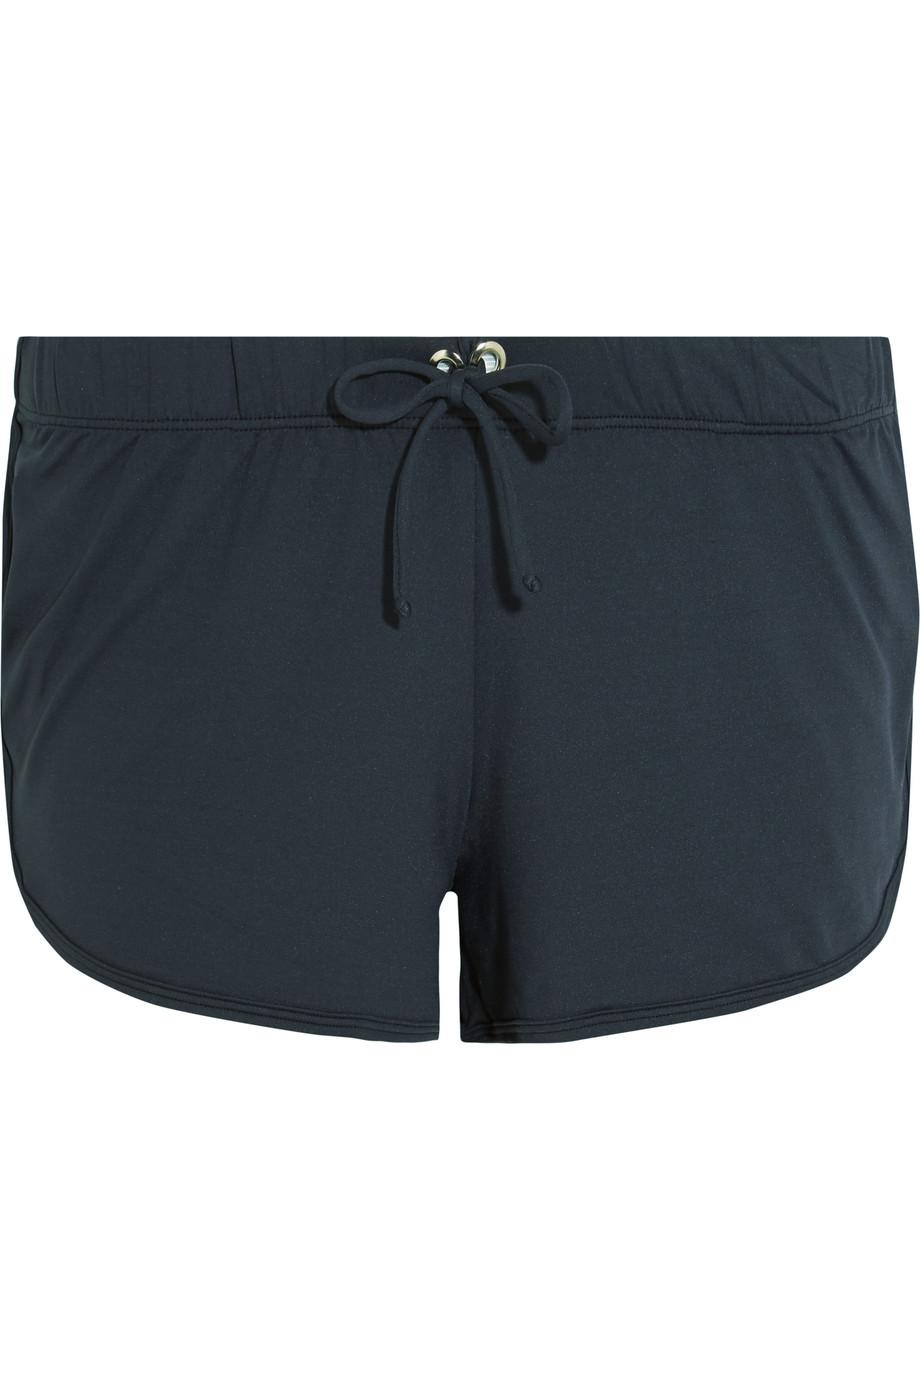 Bodyism Abi Stretch-Jersey Shorts, Black, Women's